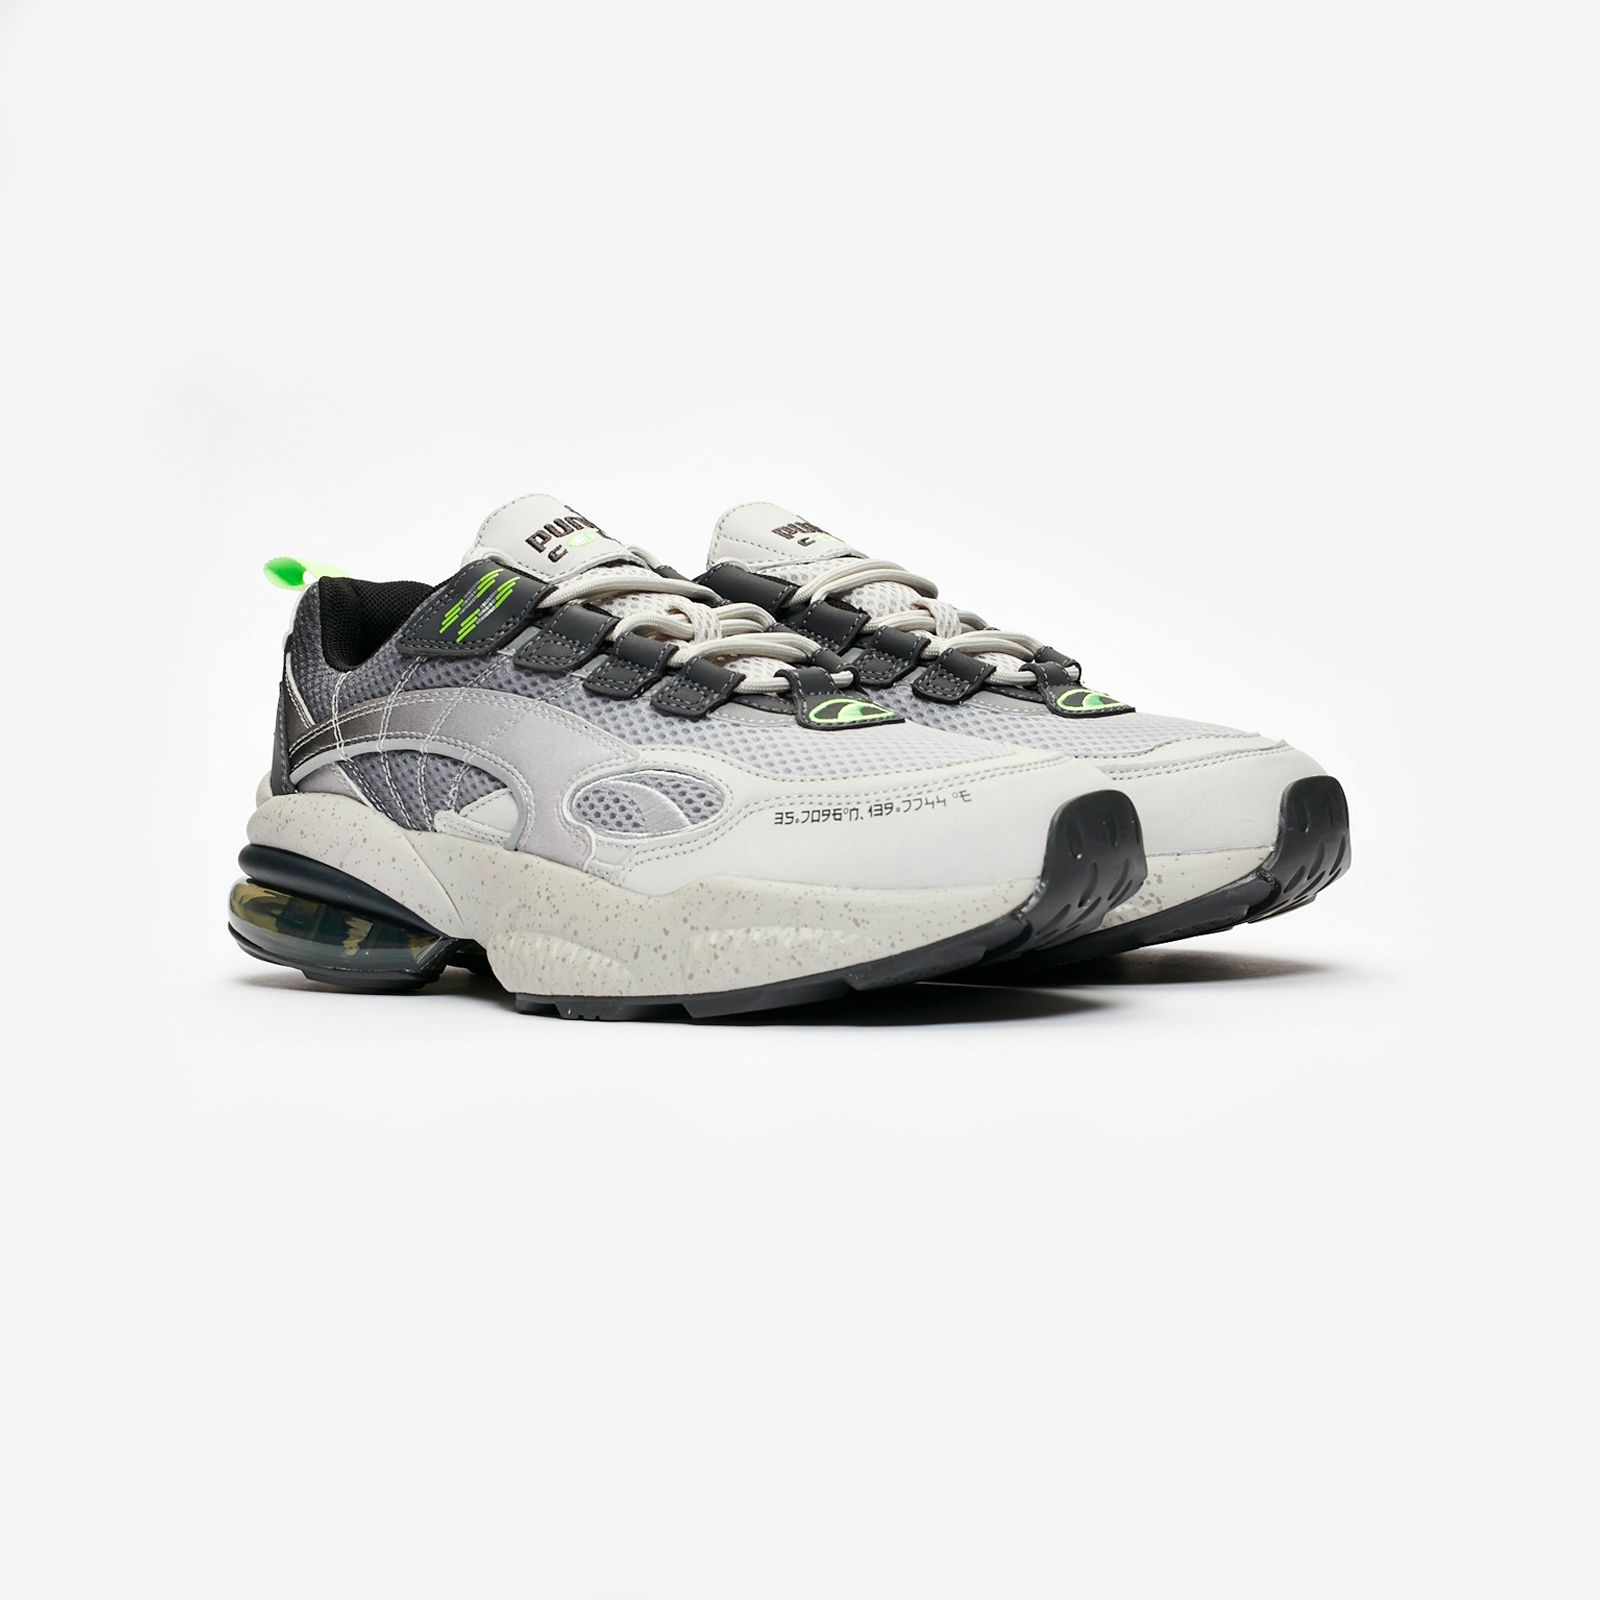 100% authentic 1ba24 a91ec Puma Cell Venom x Mita Sneakers - 370339-01 - Sneakersnstuff ...